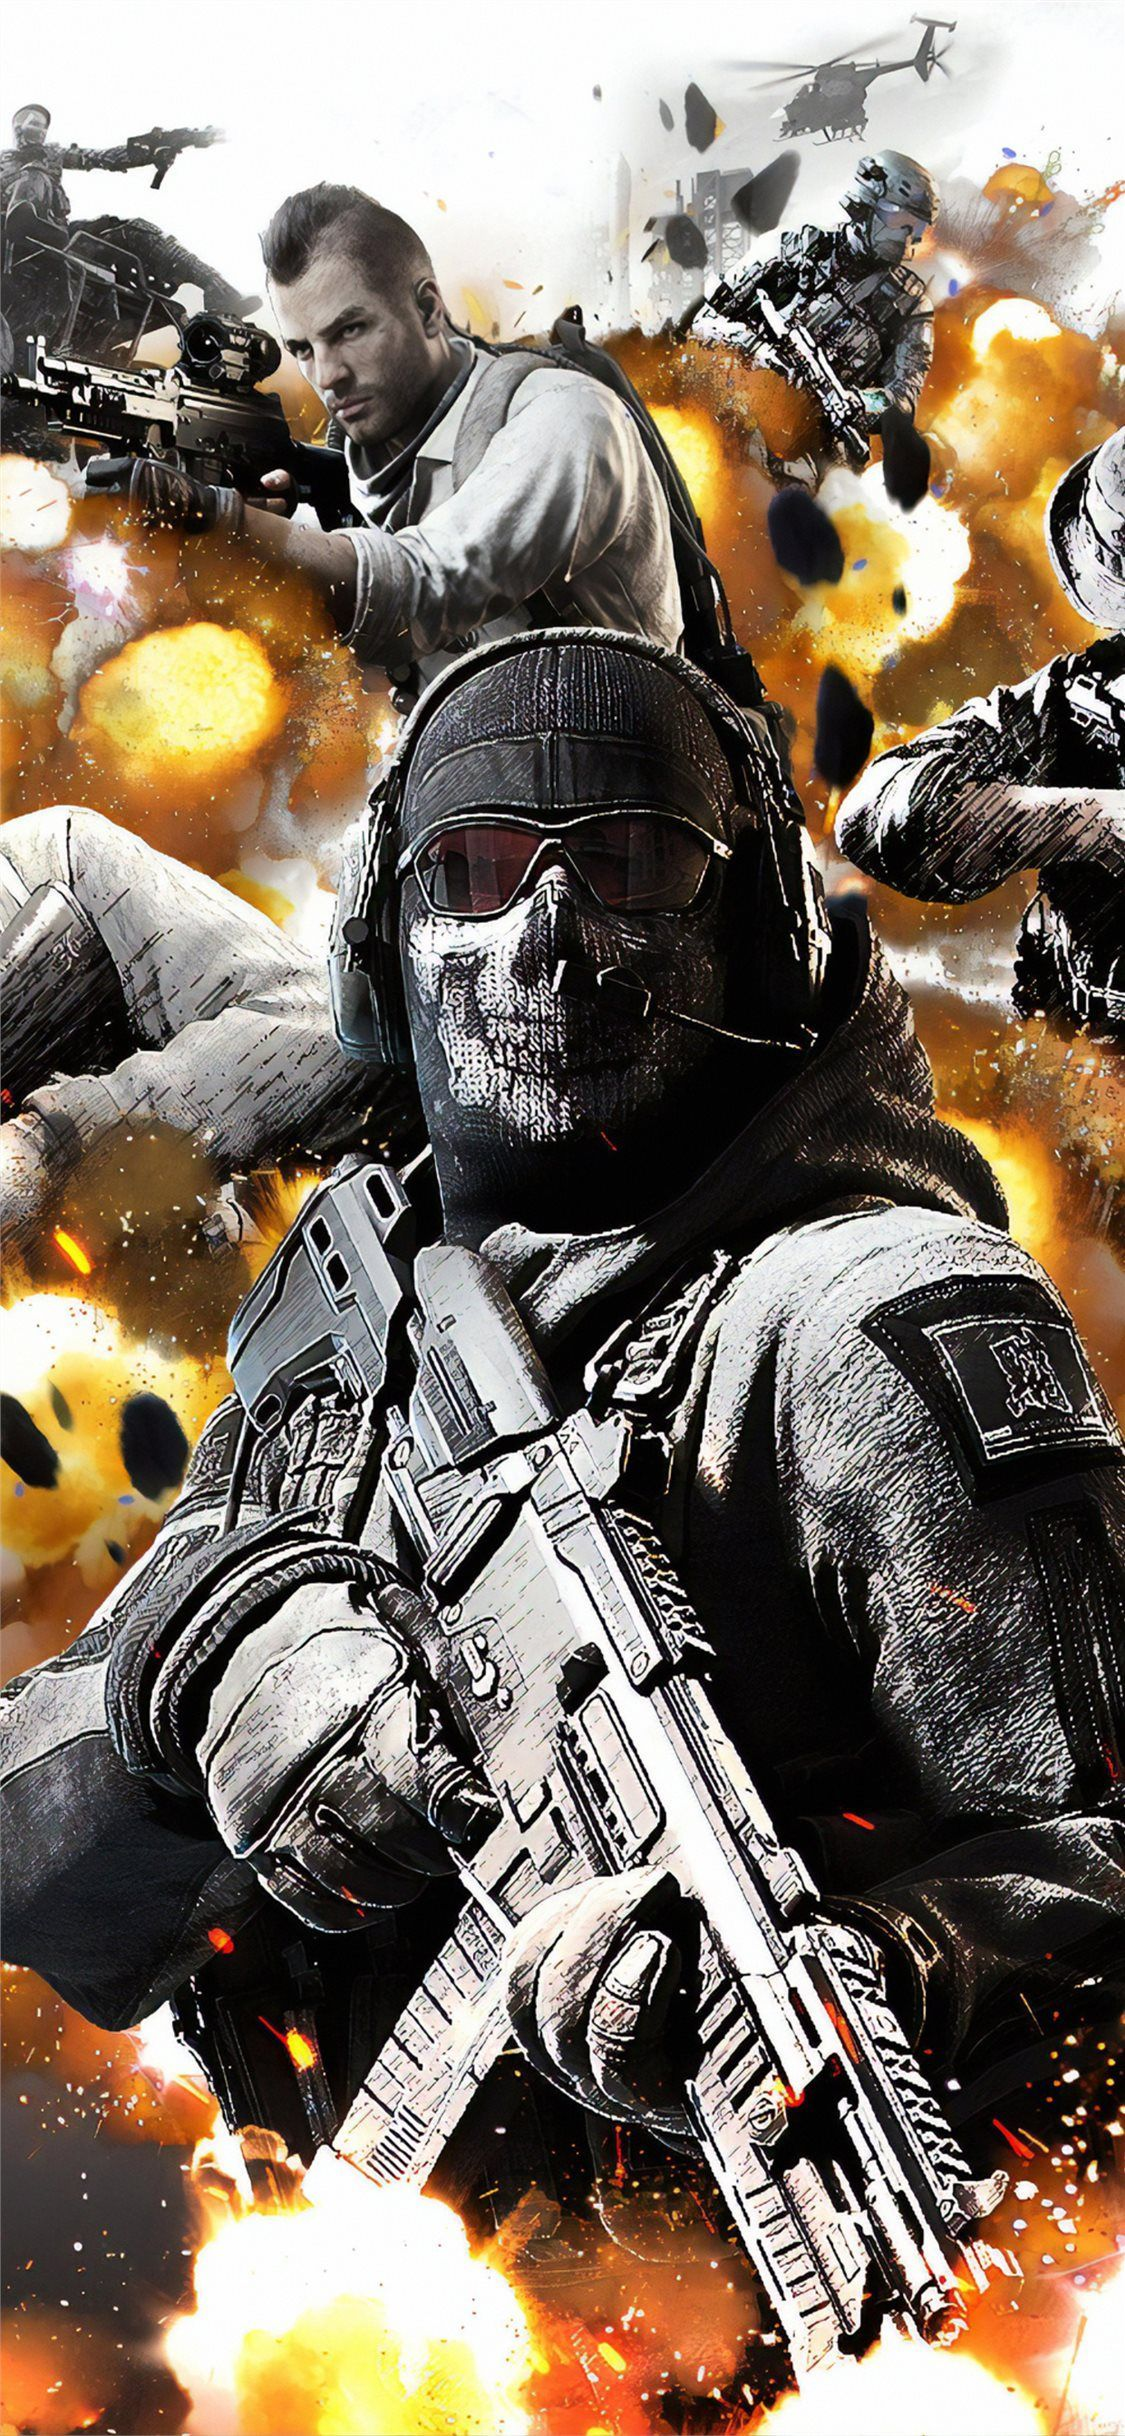 Free Download The Call Of Duty Mobile 4k Wallpaper Beaty Your Iphone Call Of 4k Fotos De Skin Portadas De Pantalla Fondos De Cine Call of duty mobile 2019 game